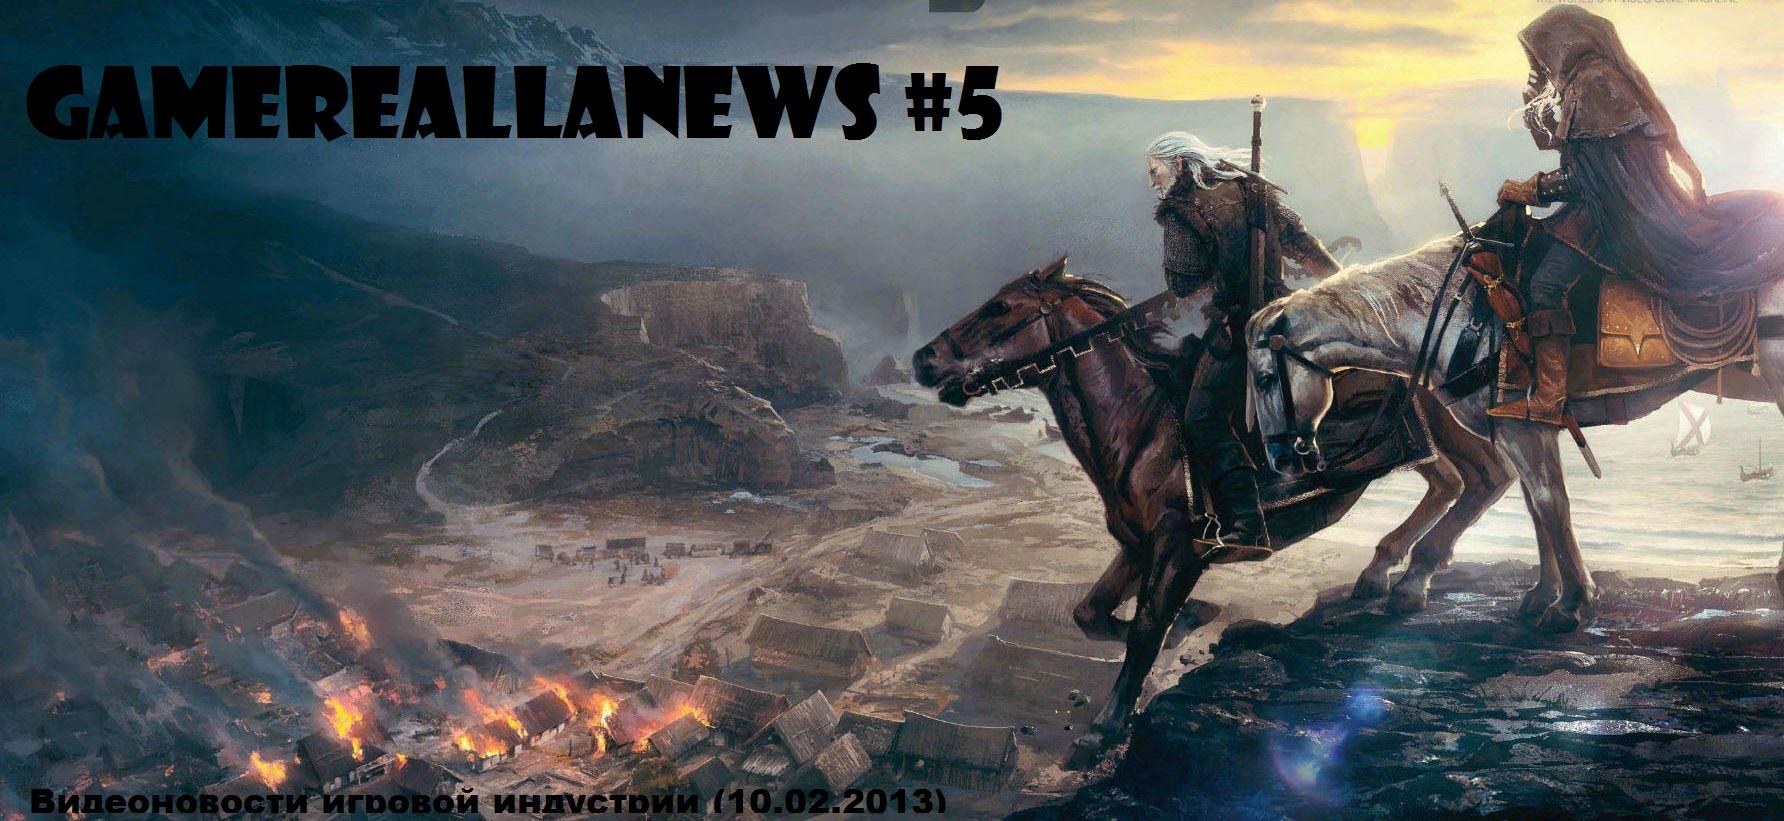 gamereallanews 5